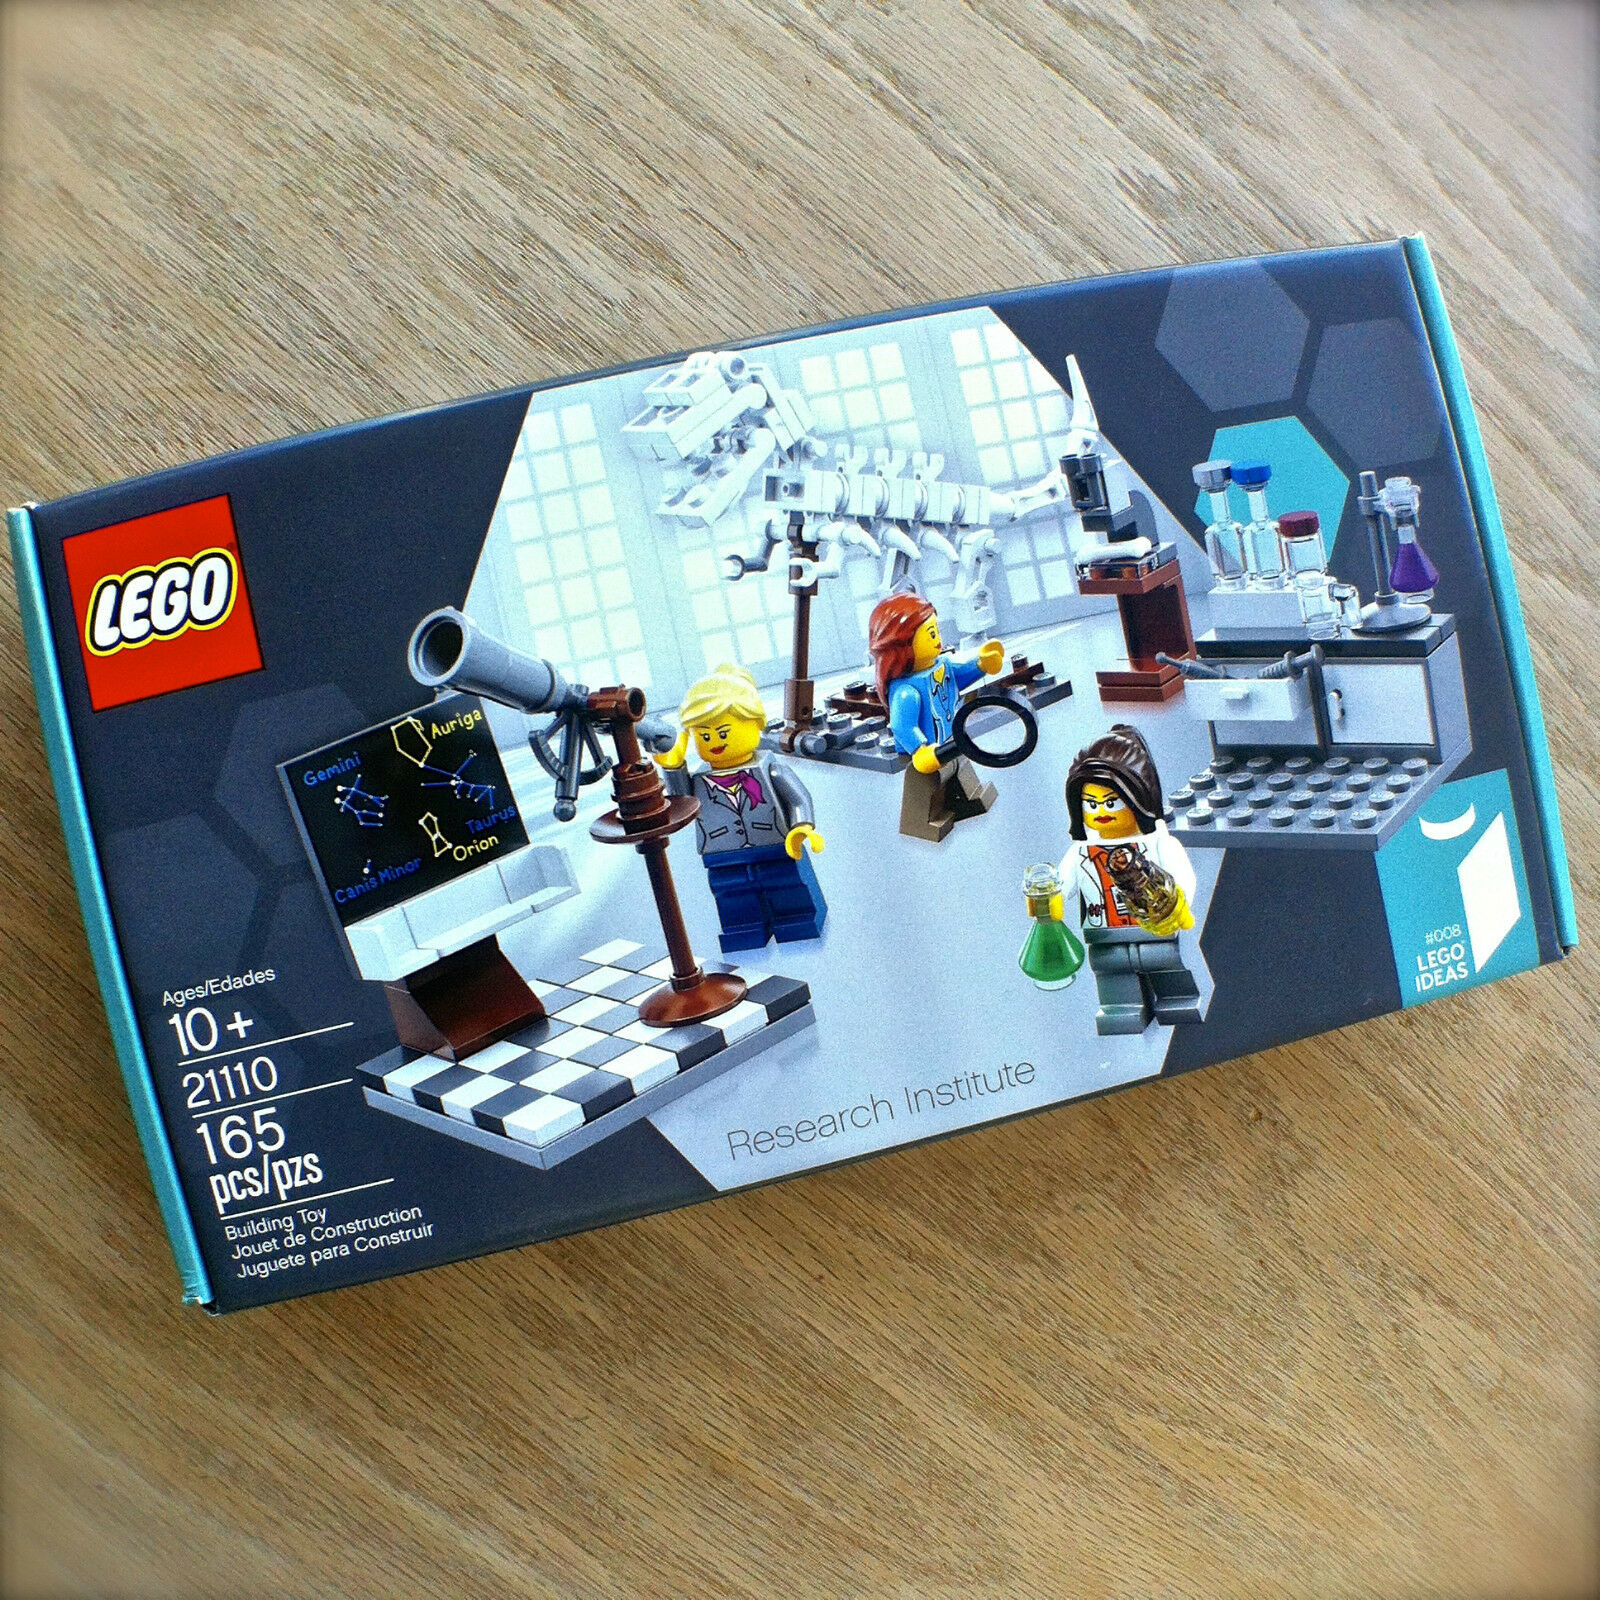 LEGO Ideas 21110 RESEARCH INSTITUTE Chemist Astronomer Paleontologist 165PCS gal